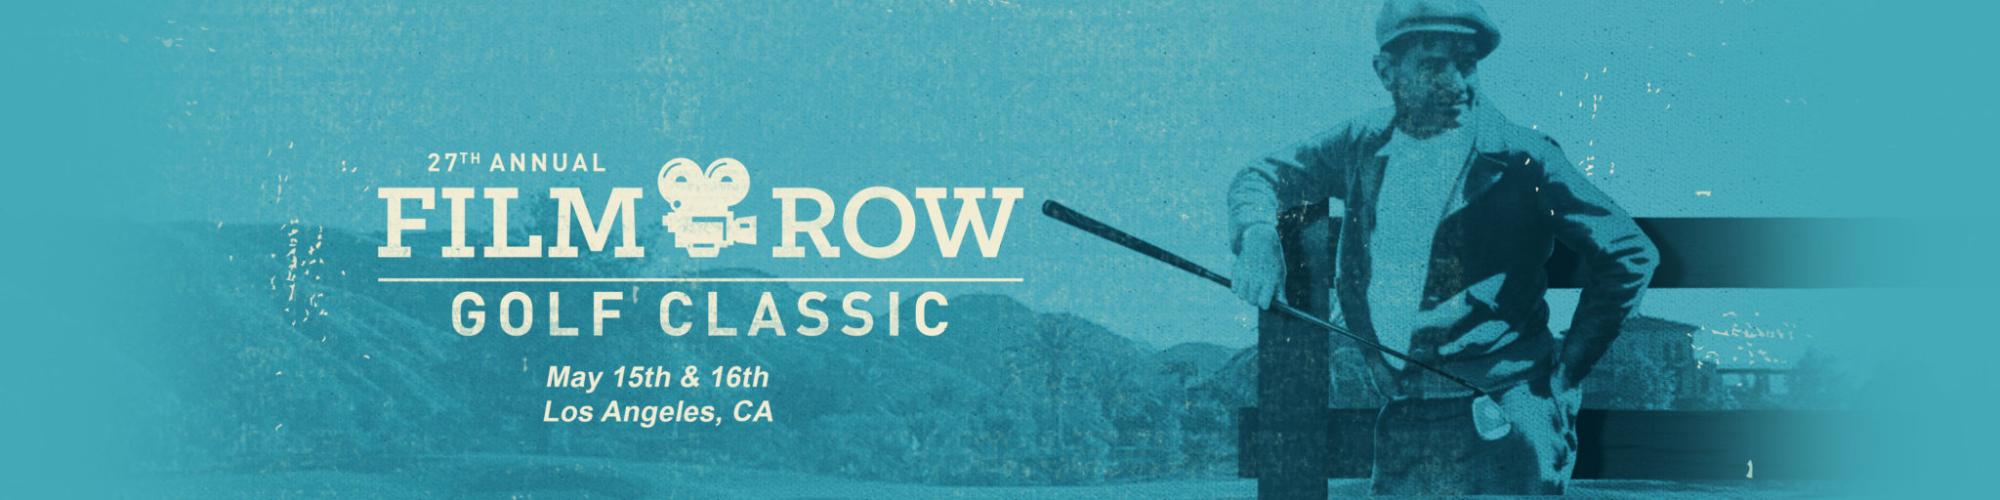 WRFilmRow_GolfClassic2019_Masthead_2-5-19 – date